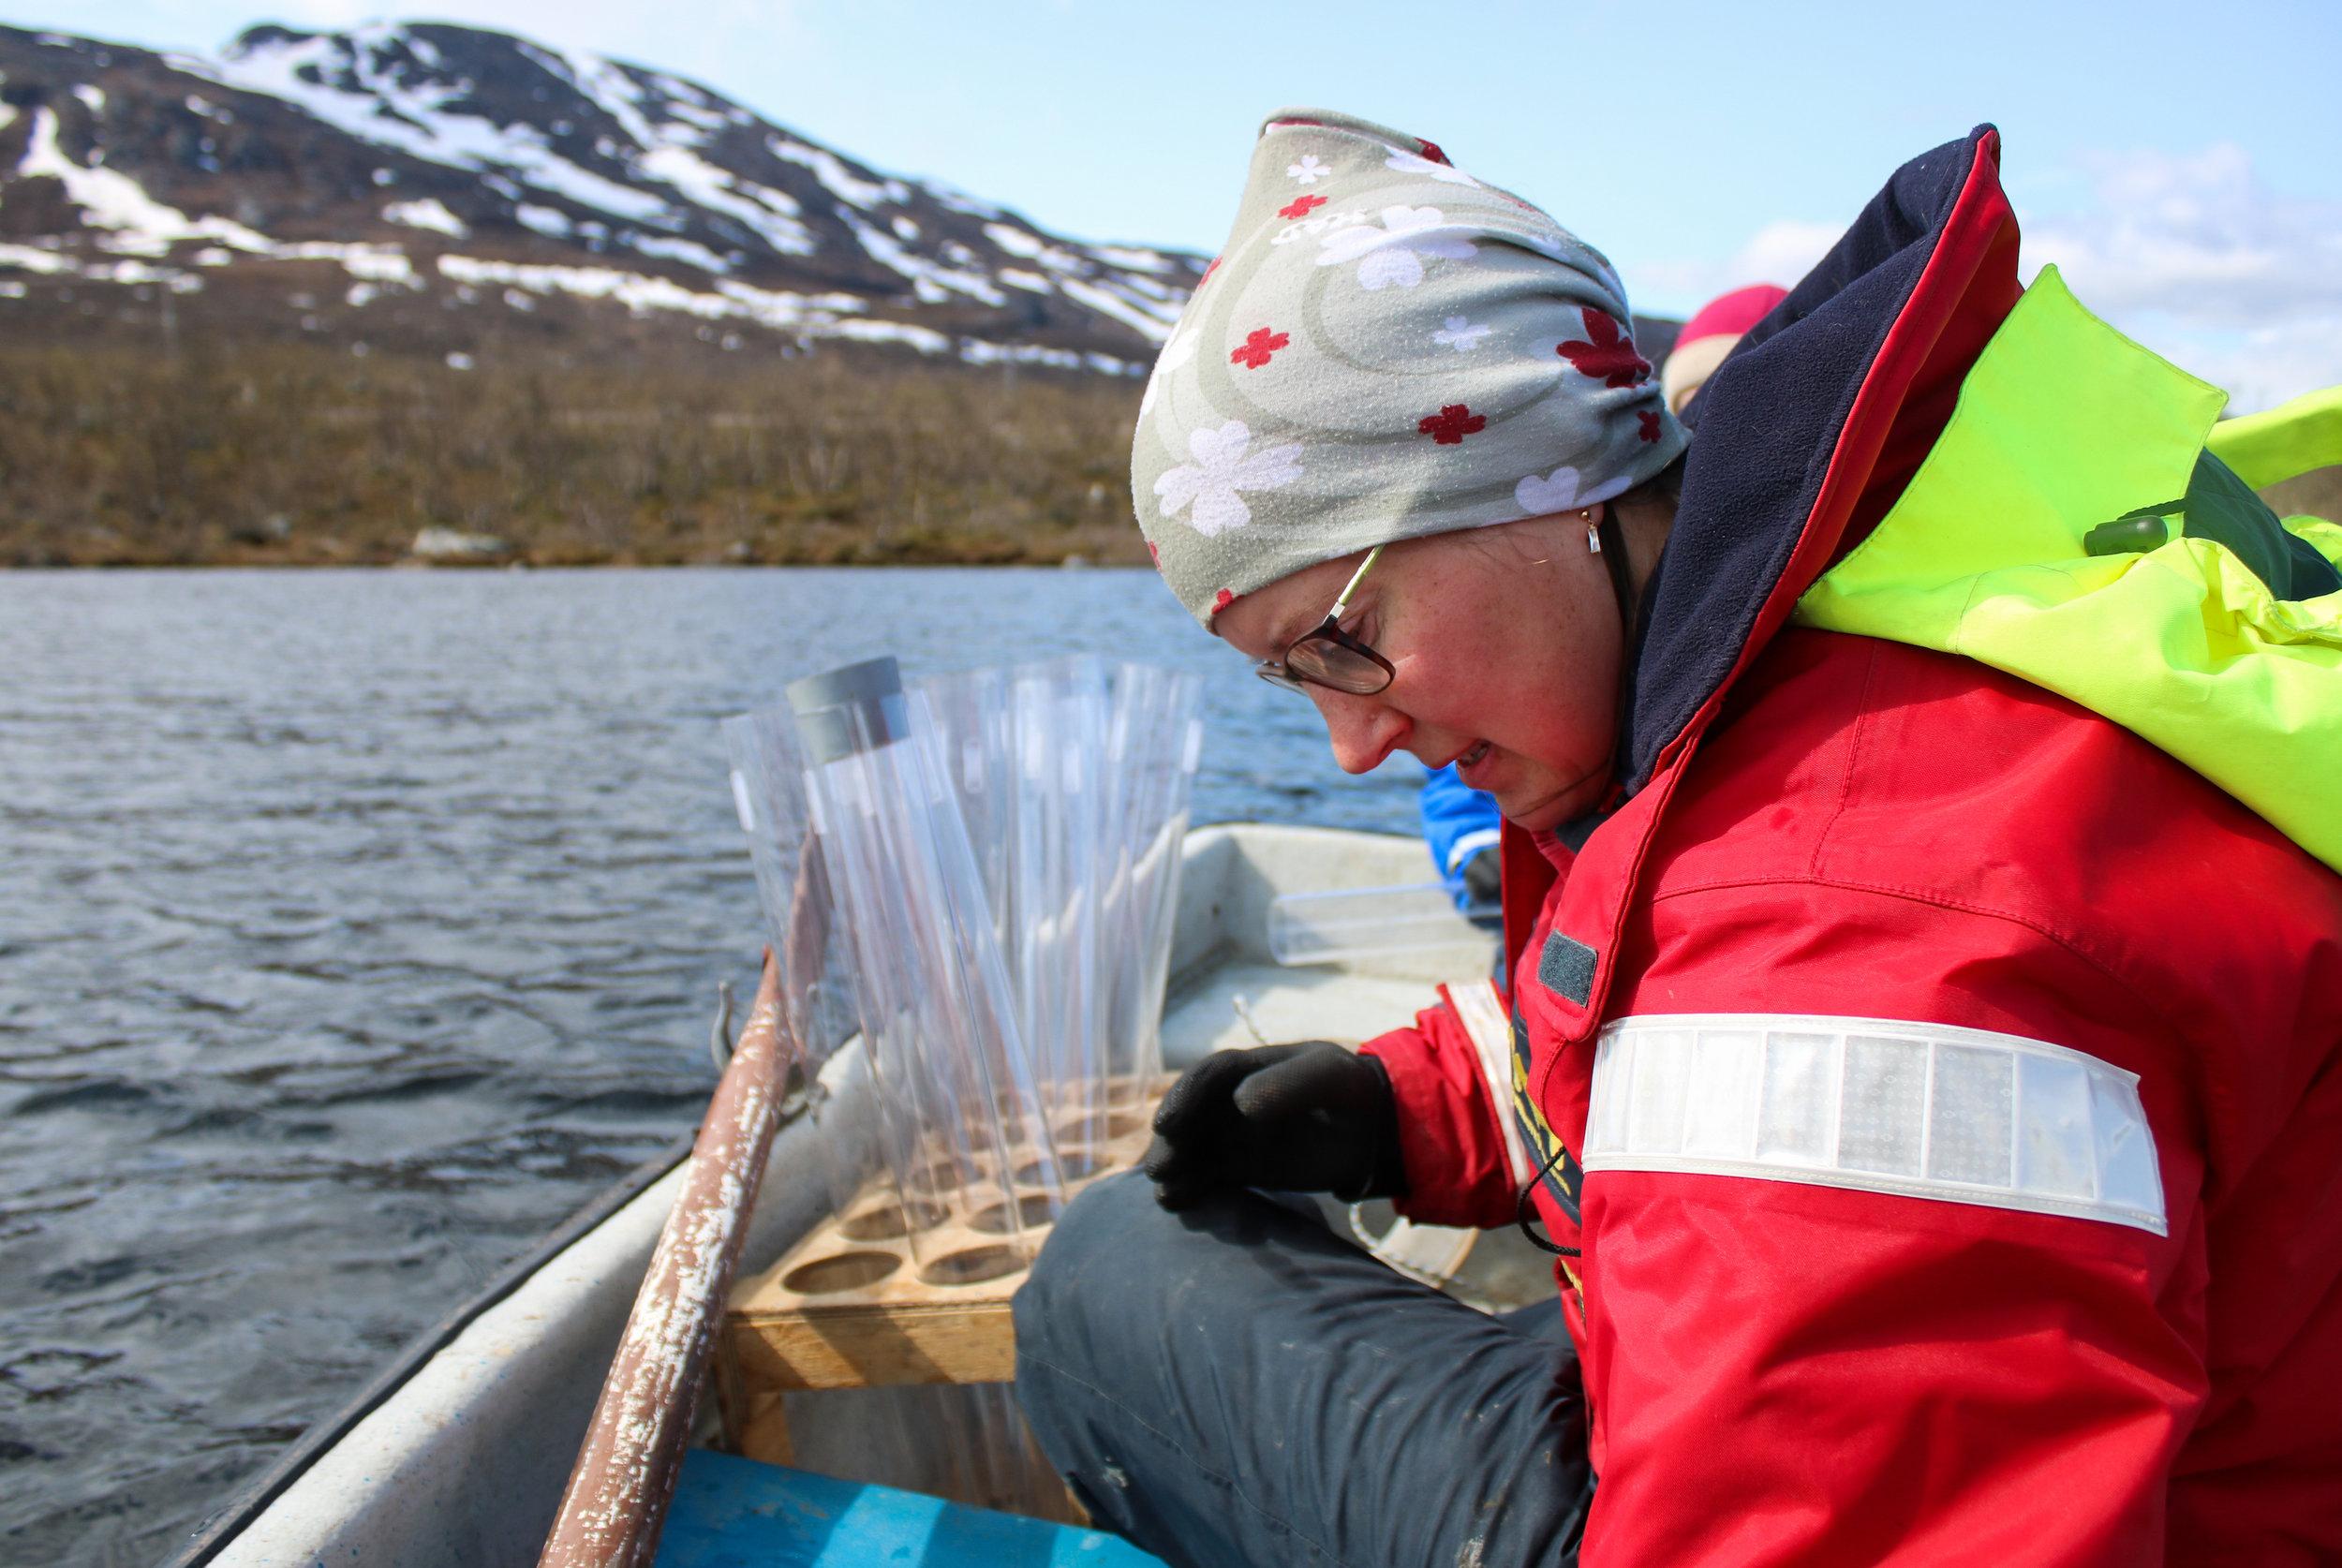 Jenny Ask Sediment Sampling Lake Almberga 03June19 Photo by Emma.jpg